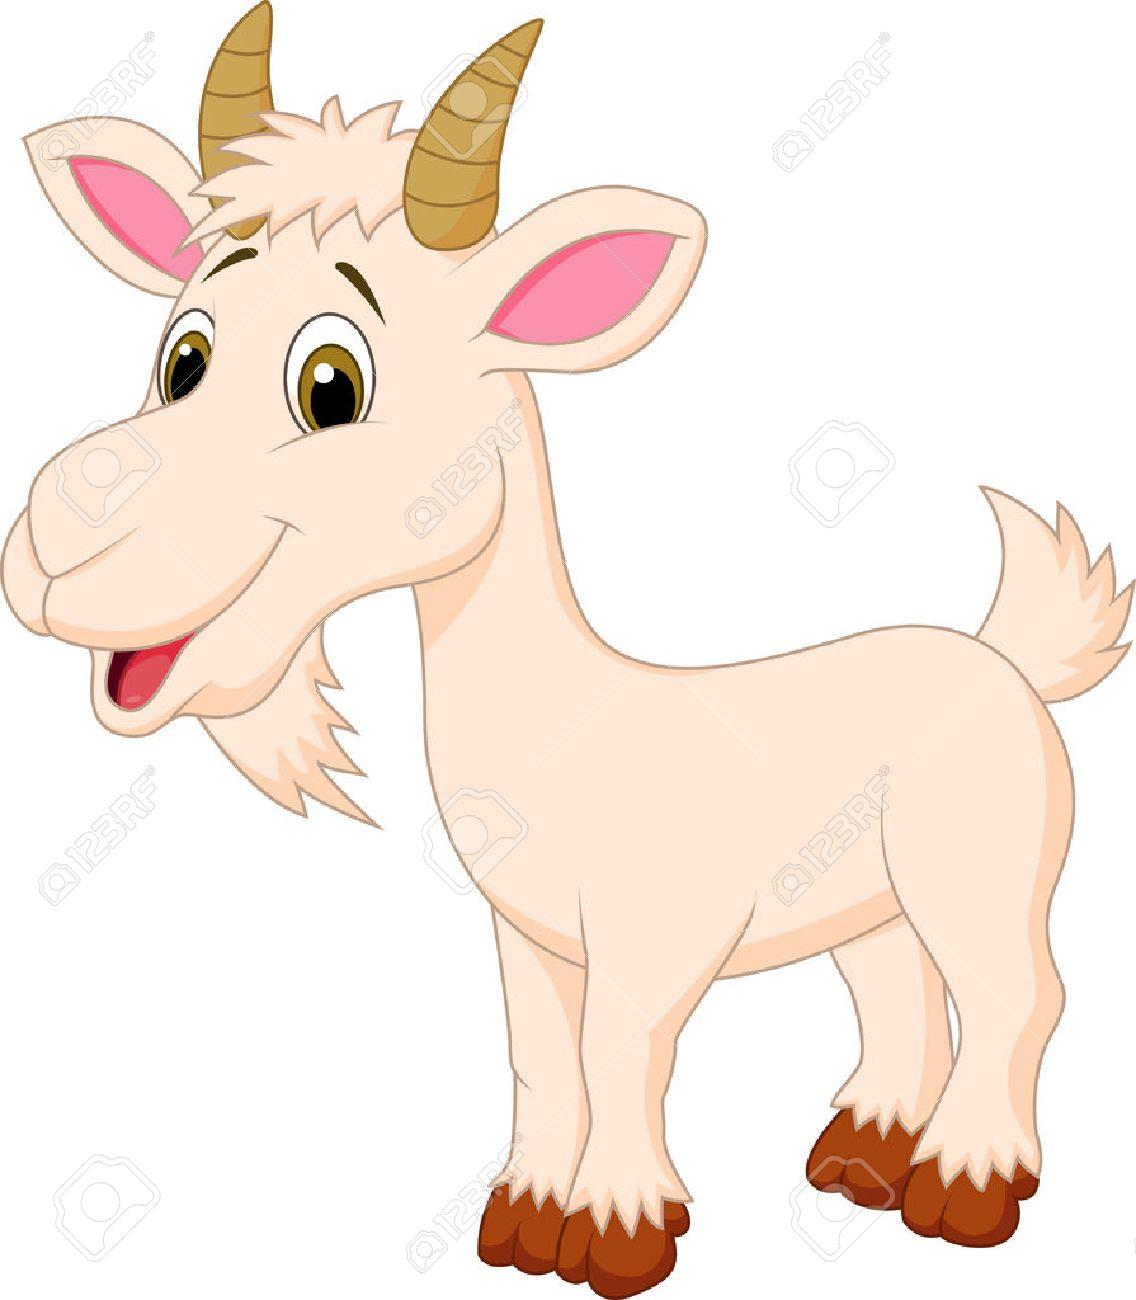 Goat cartoon character - 22637319